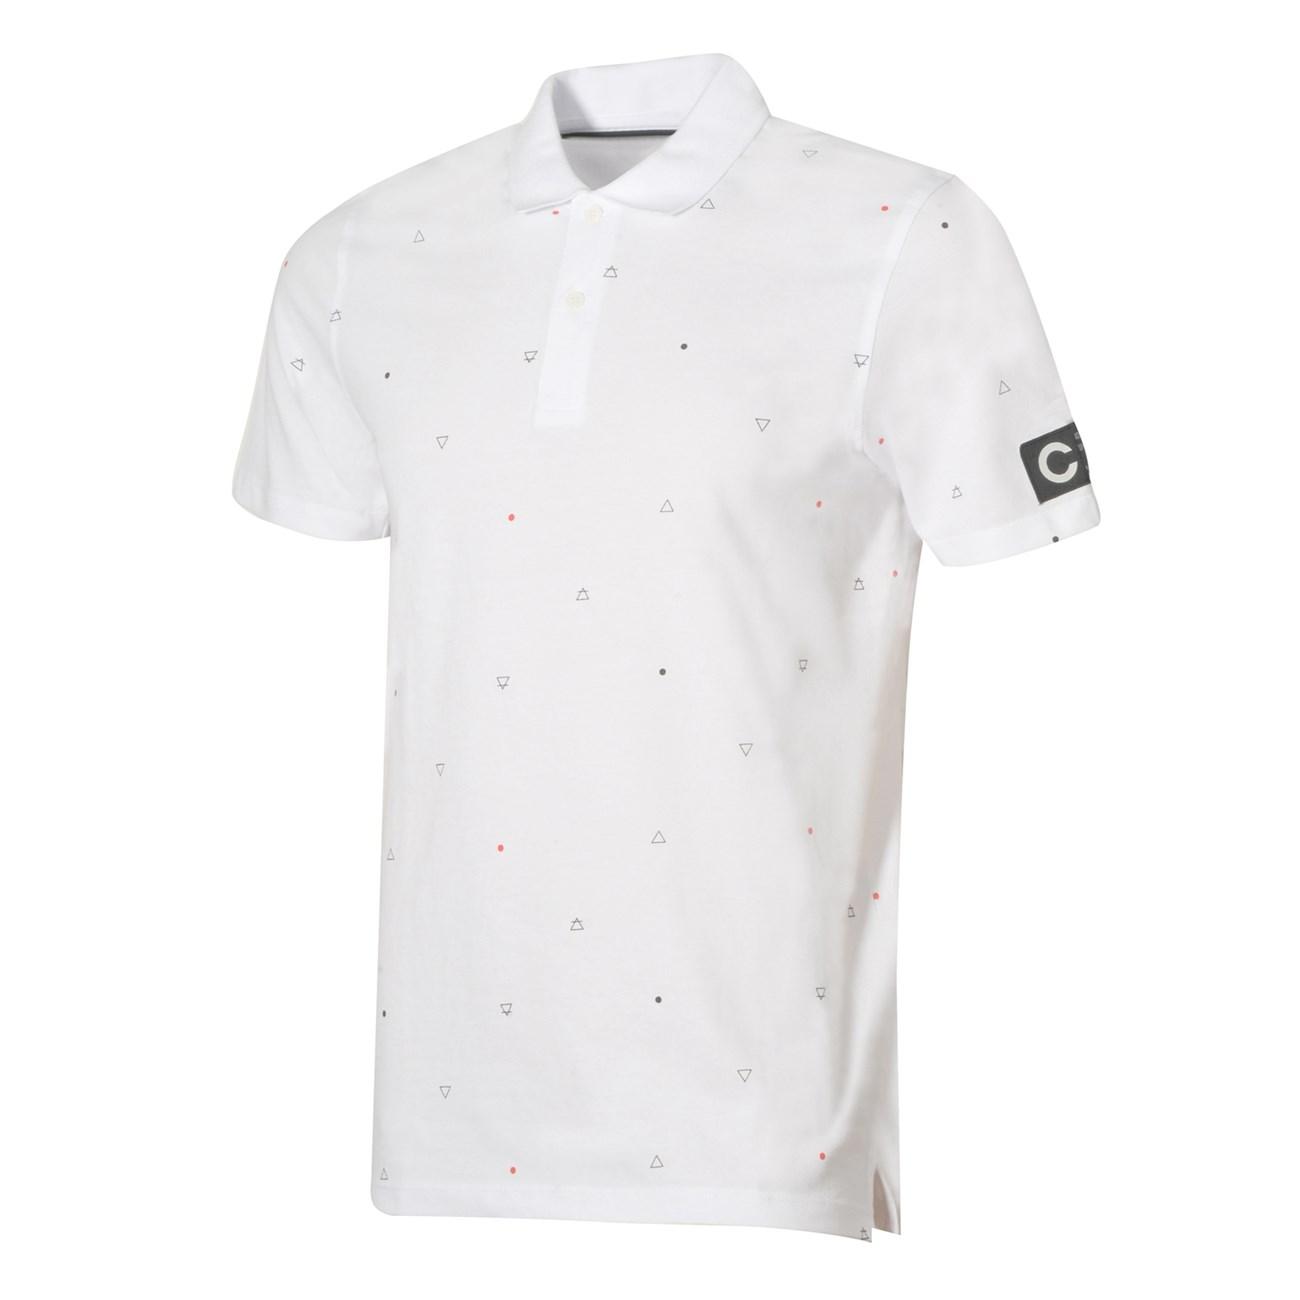 860edd87c5038 JACK   JONES JCORIVER POLO SS   Ανδρικά Polo Shirts   INTERSPORT